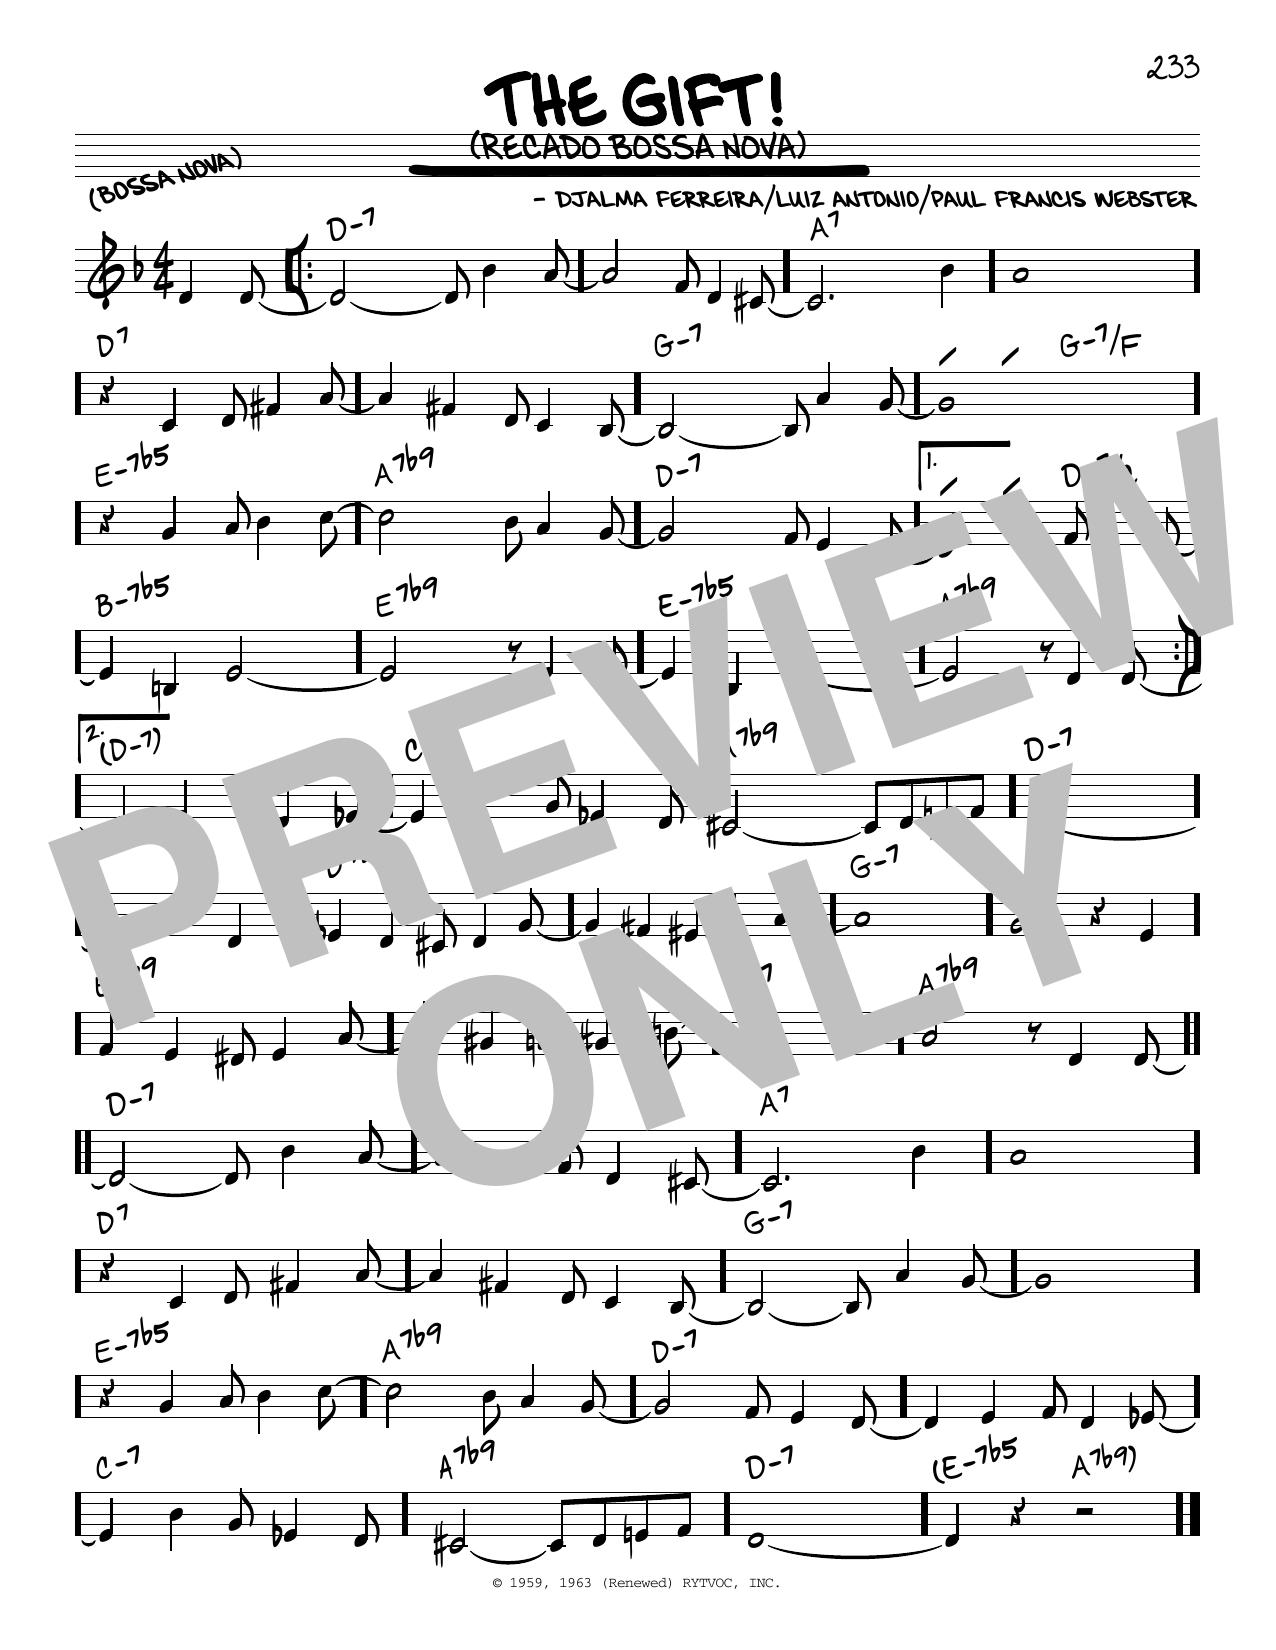 Sheet Music Digital Files To Print Licensed Djalma Ferreira